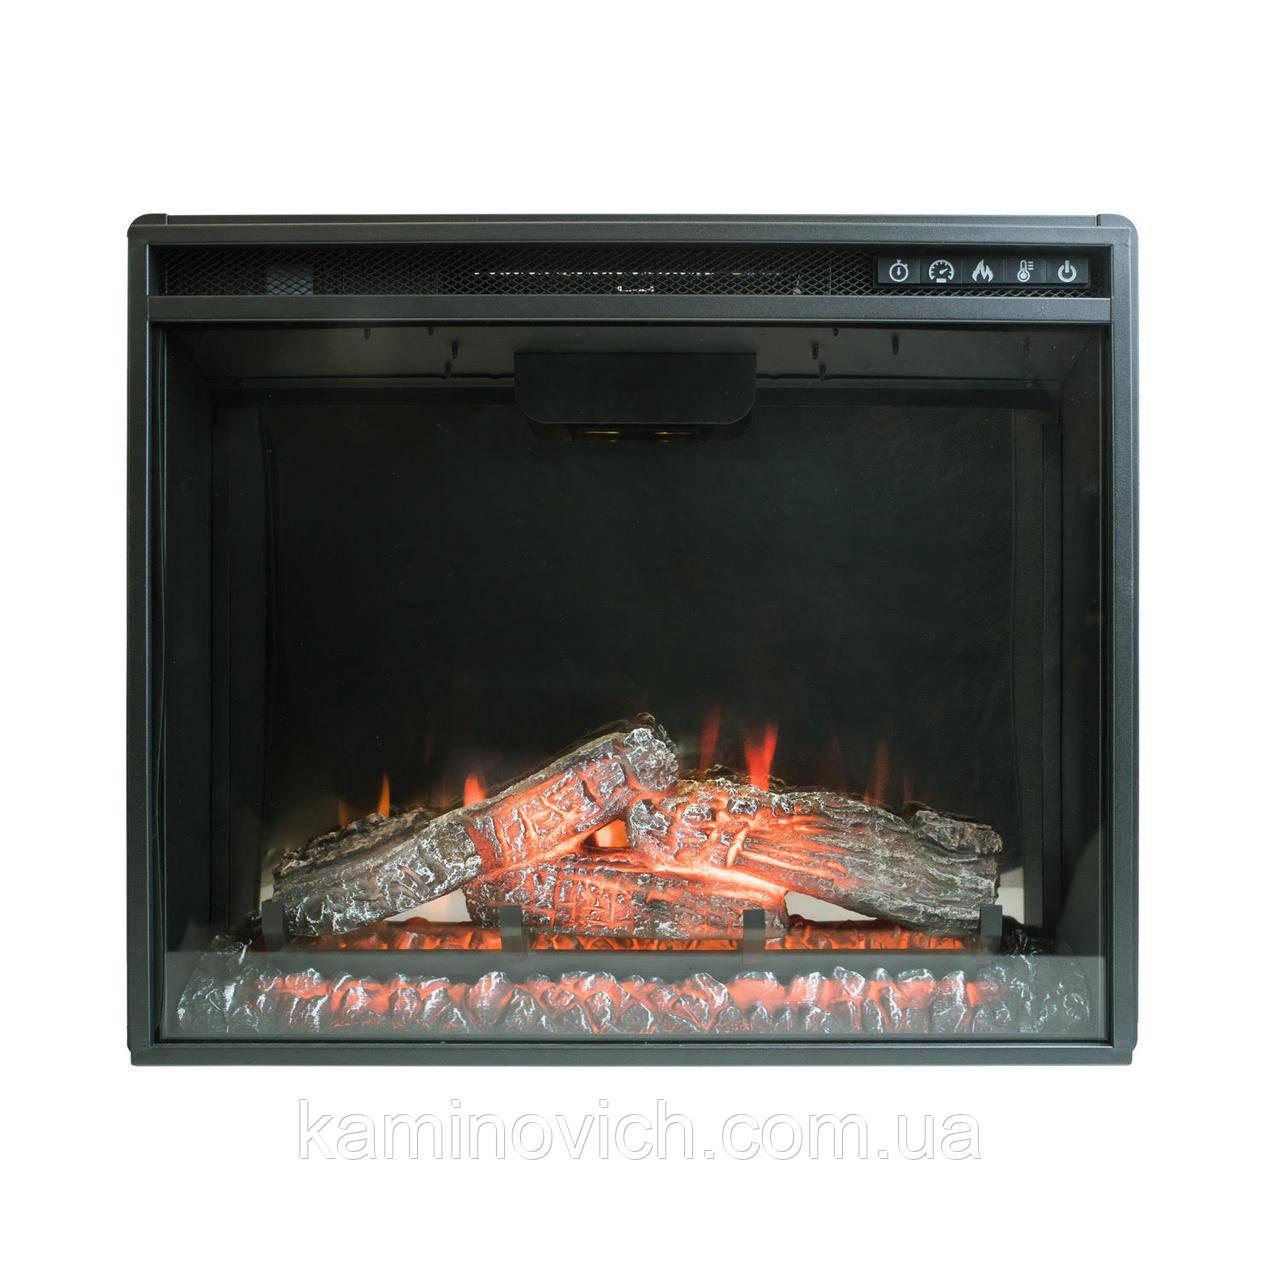 Электрический камин Bonfire Jupiter 33 A